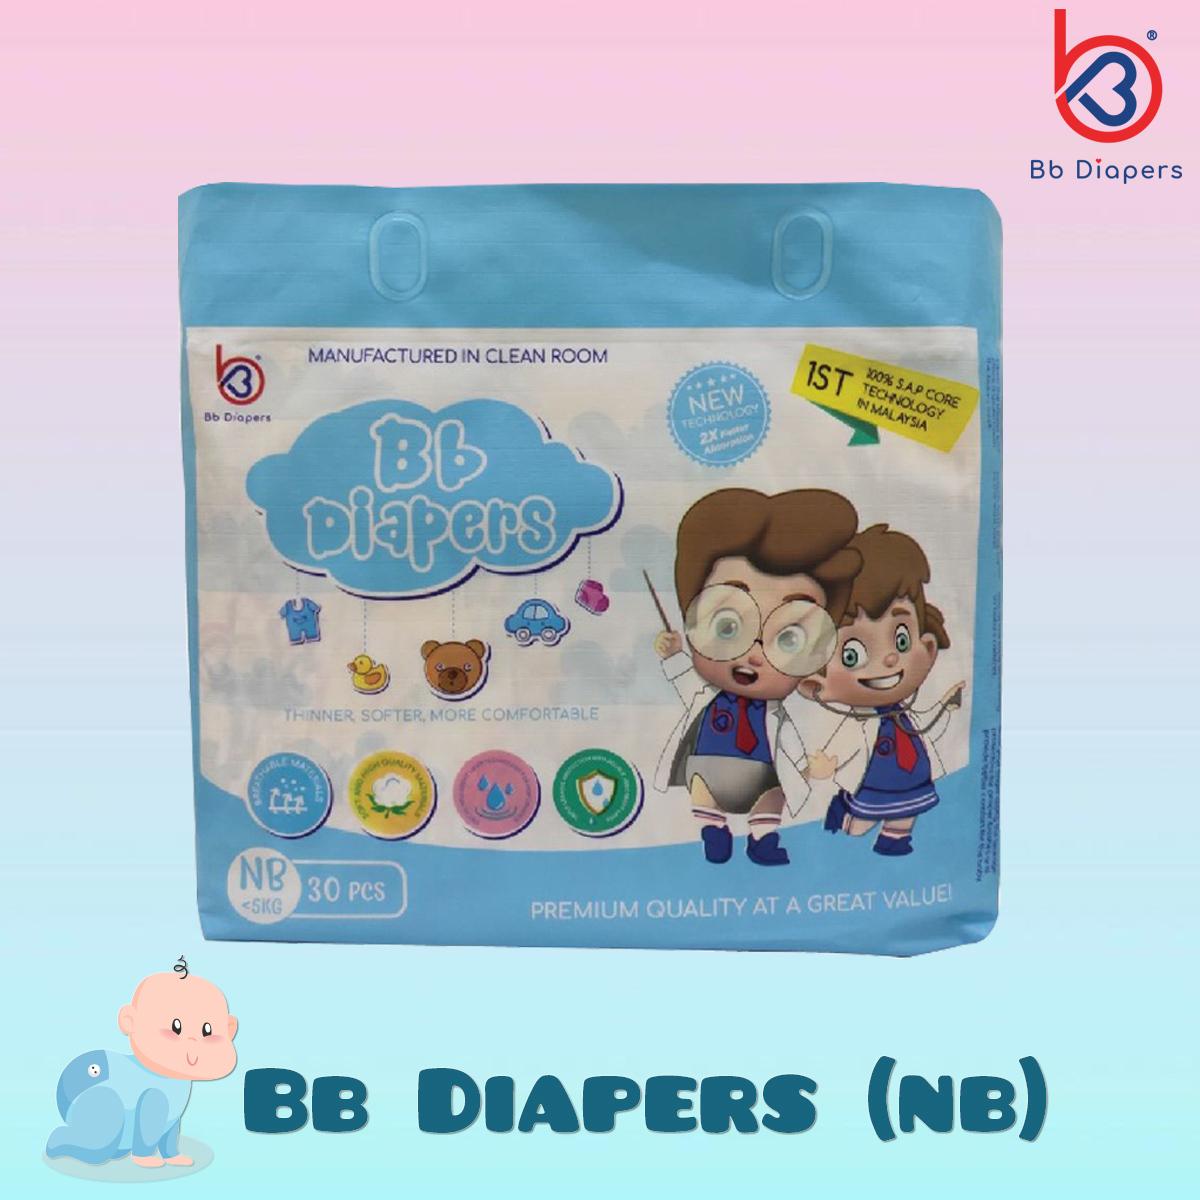 bb diapers (nb).jpg